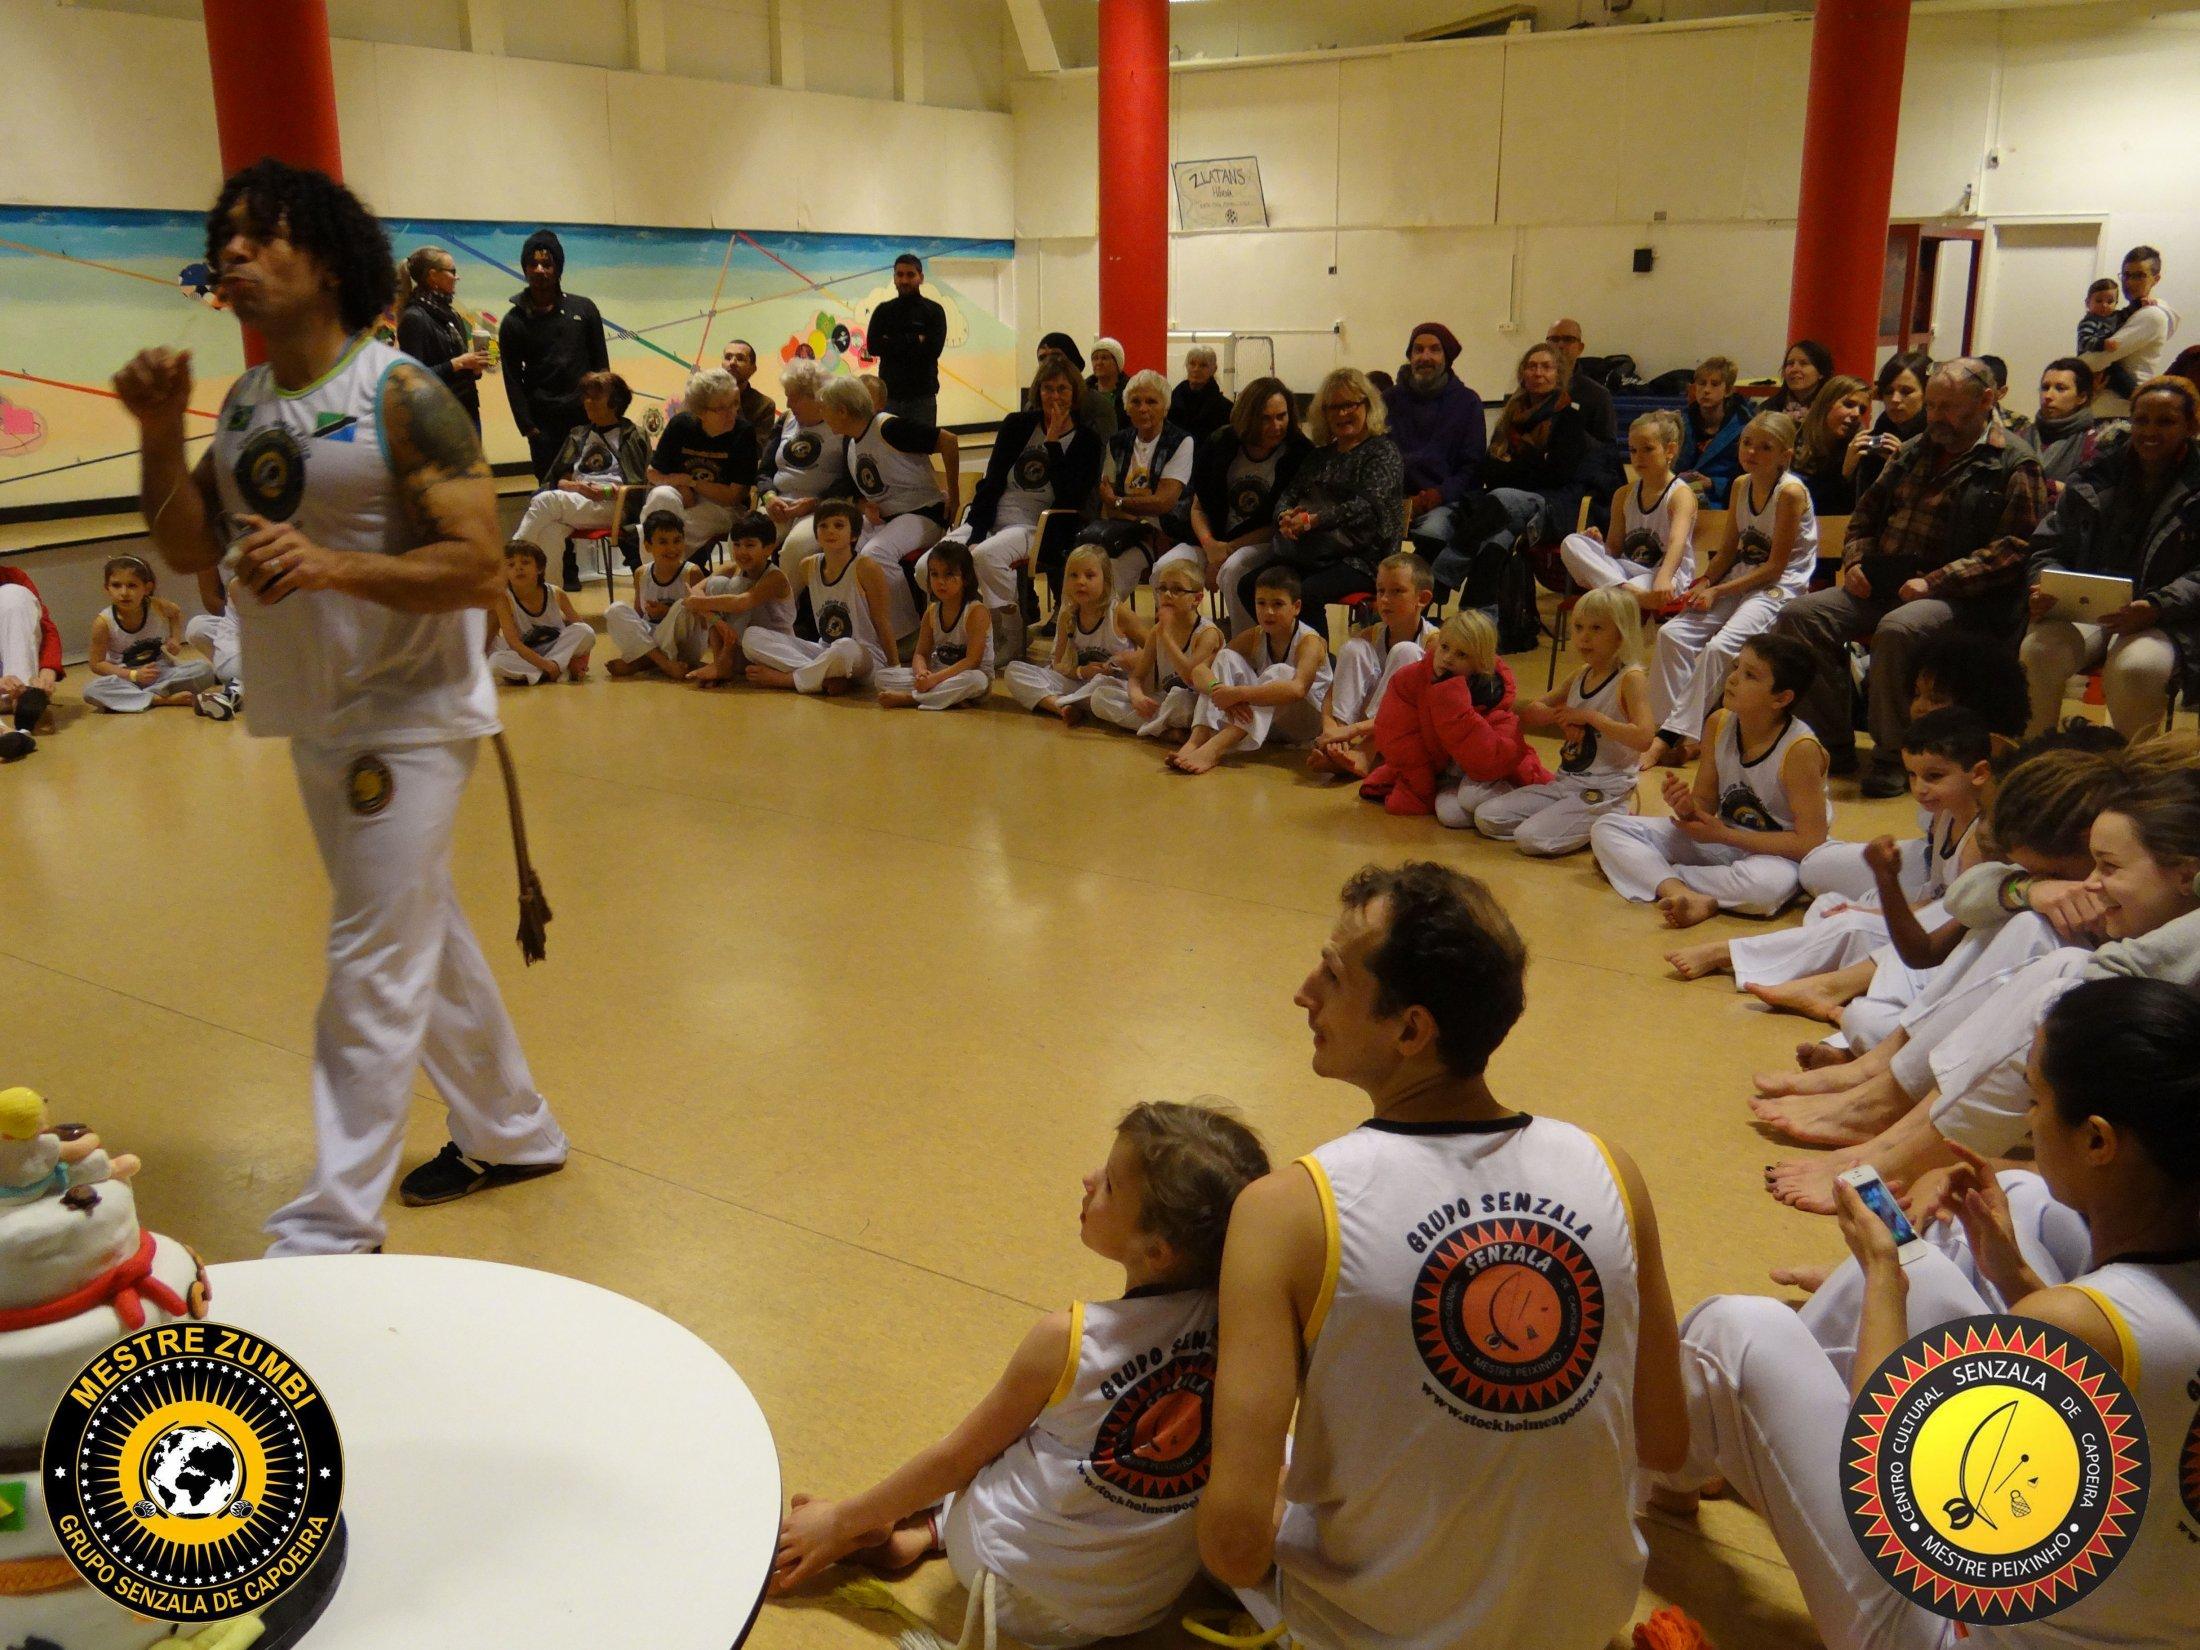 2013-12-14 - Capoeira 010